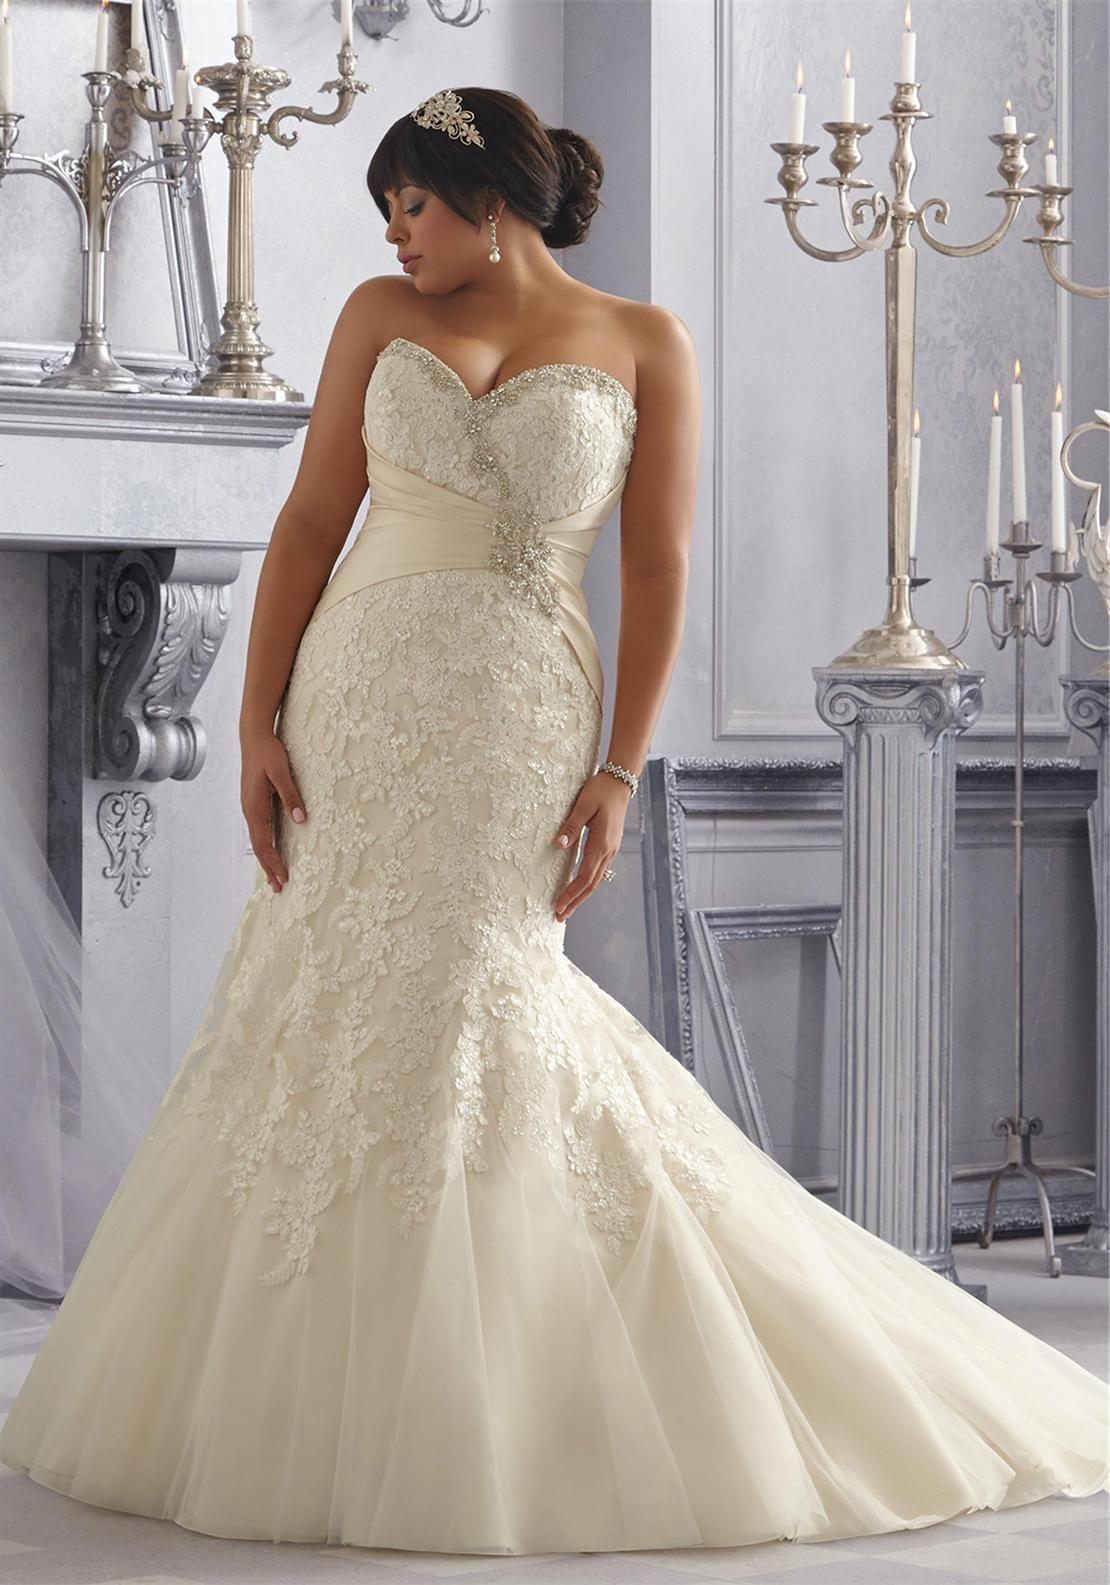 Mori Lee 3165 Debra\'s Bridal Shop at the Avenues 9365 Philips Hwy ...